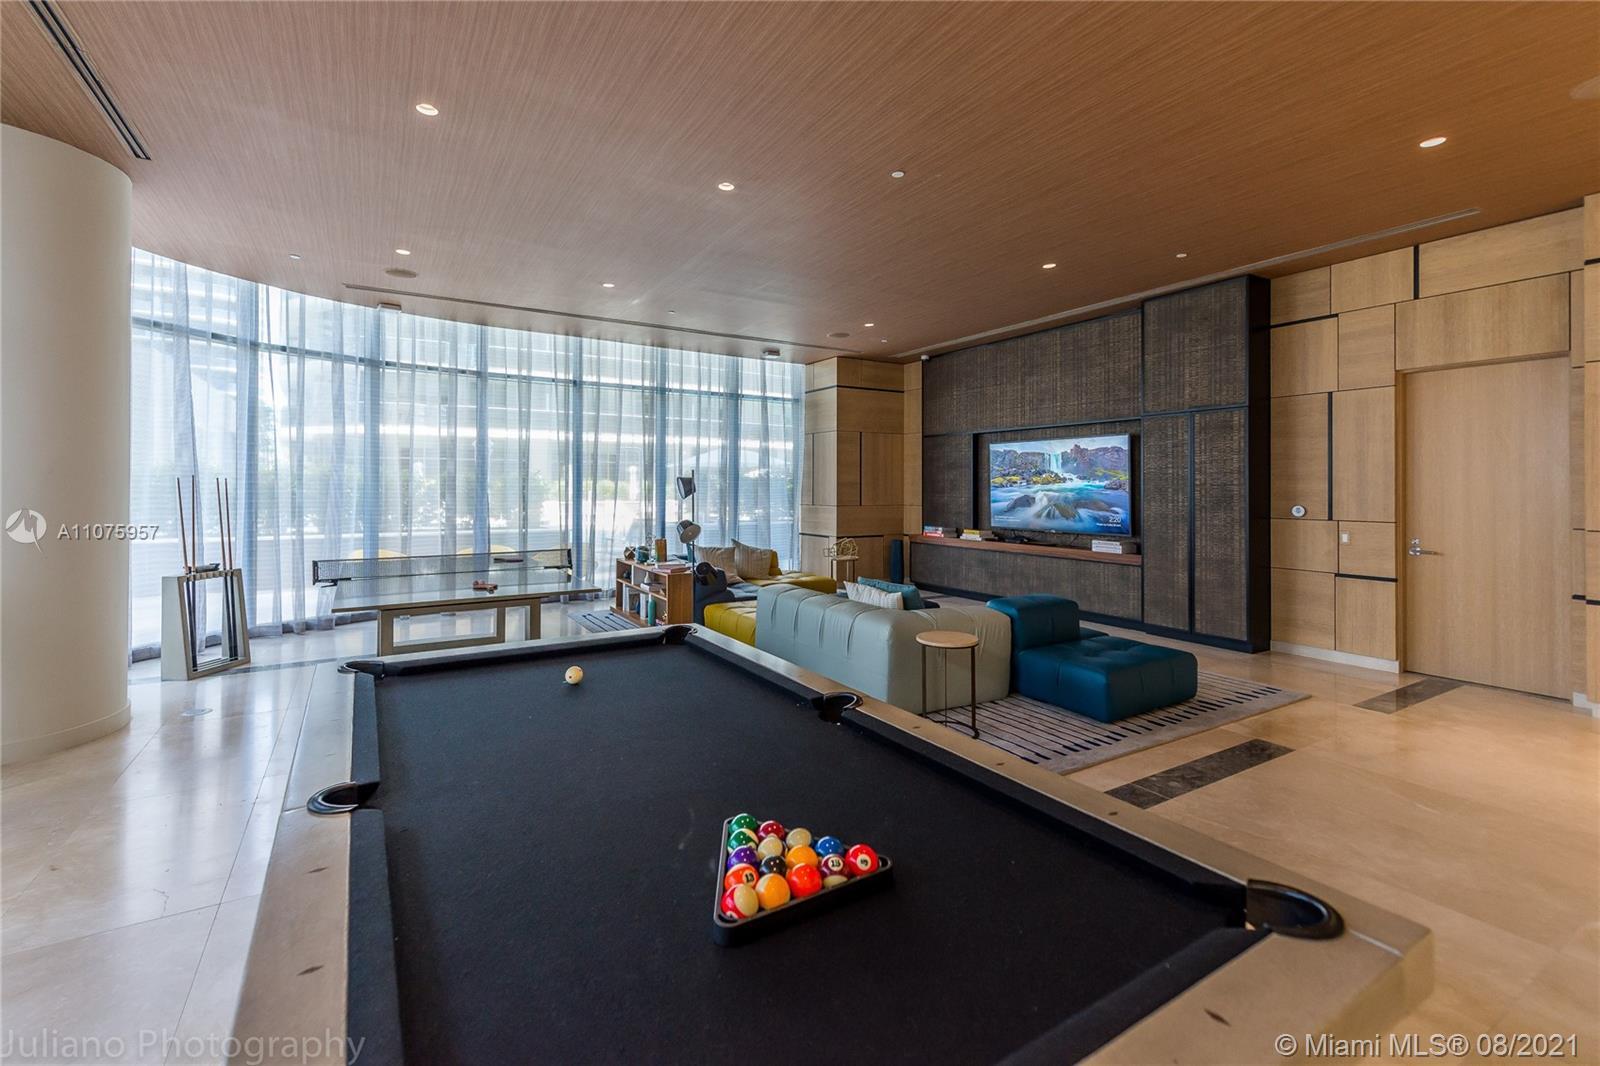 Entertainment Room- Billiard